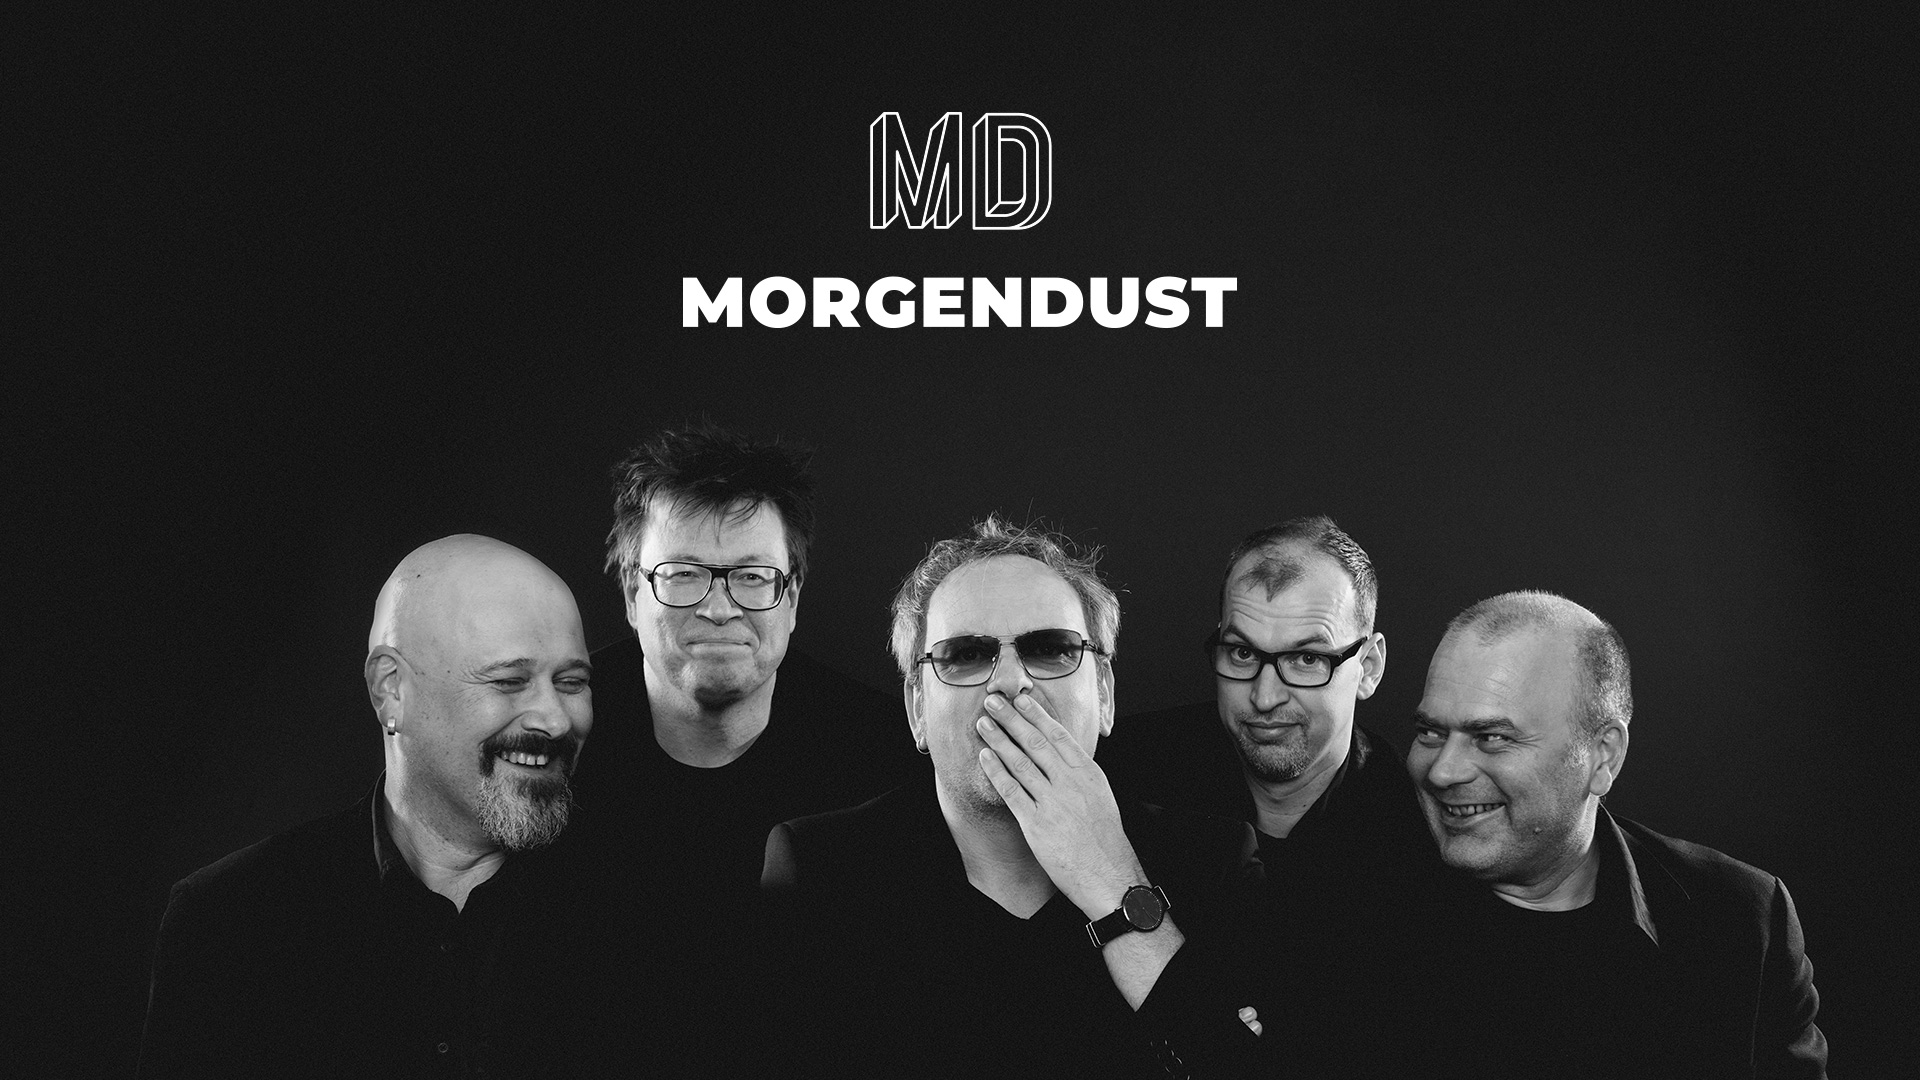 Morgendust + logo 1920x1080